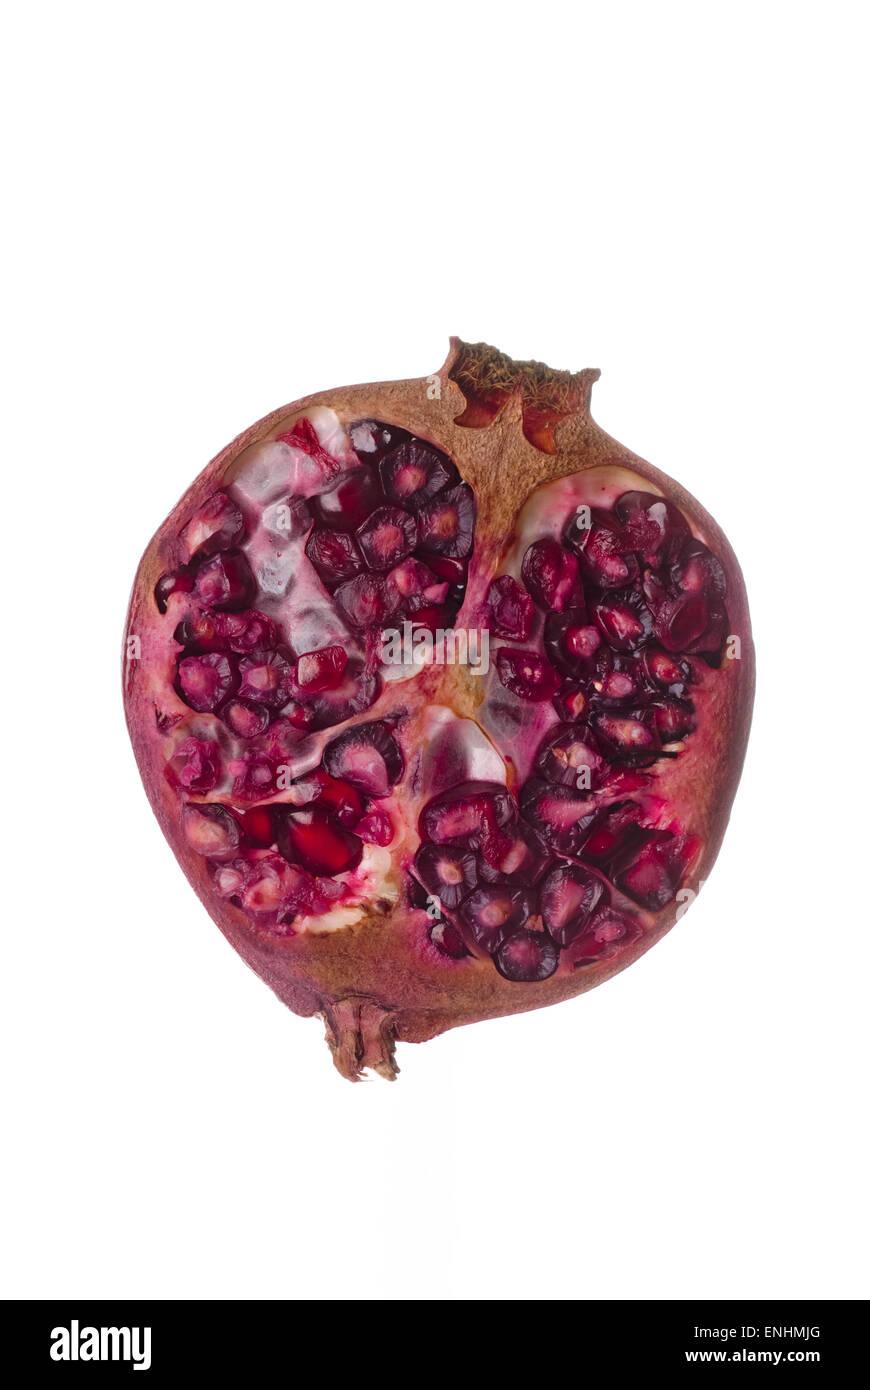 Half pomegranate on white background. - Stock Image